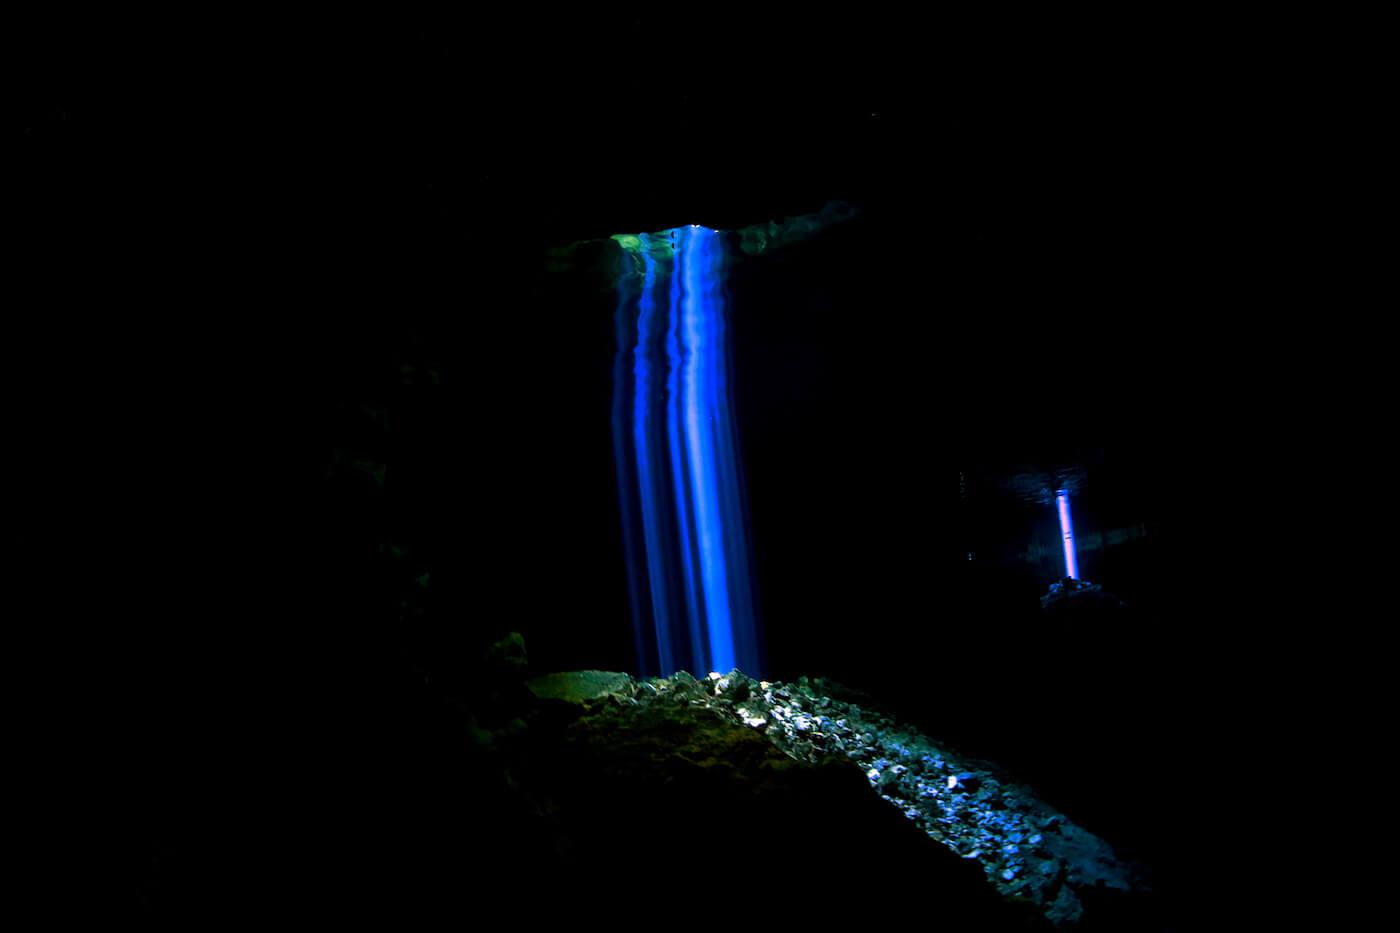 cenote Tajma-Ha